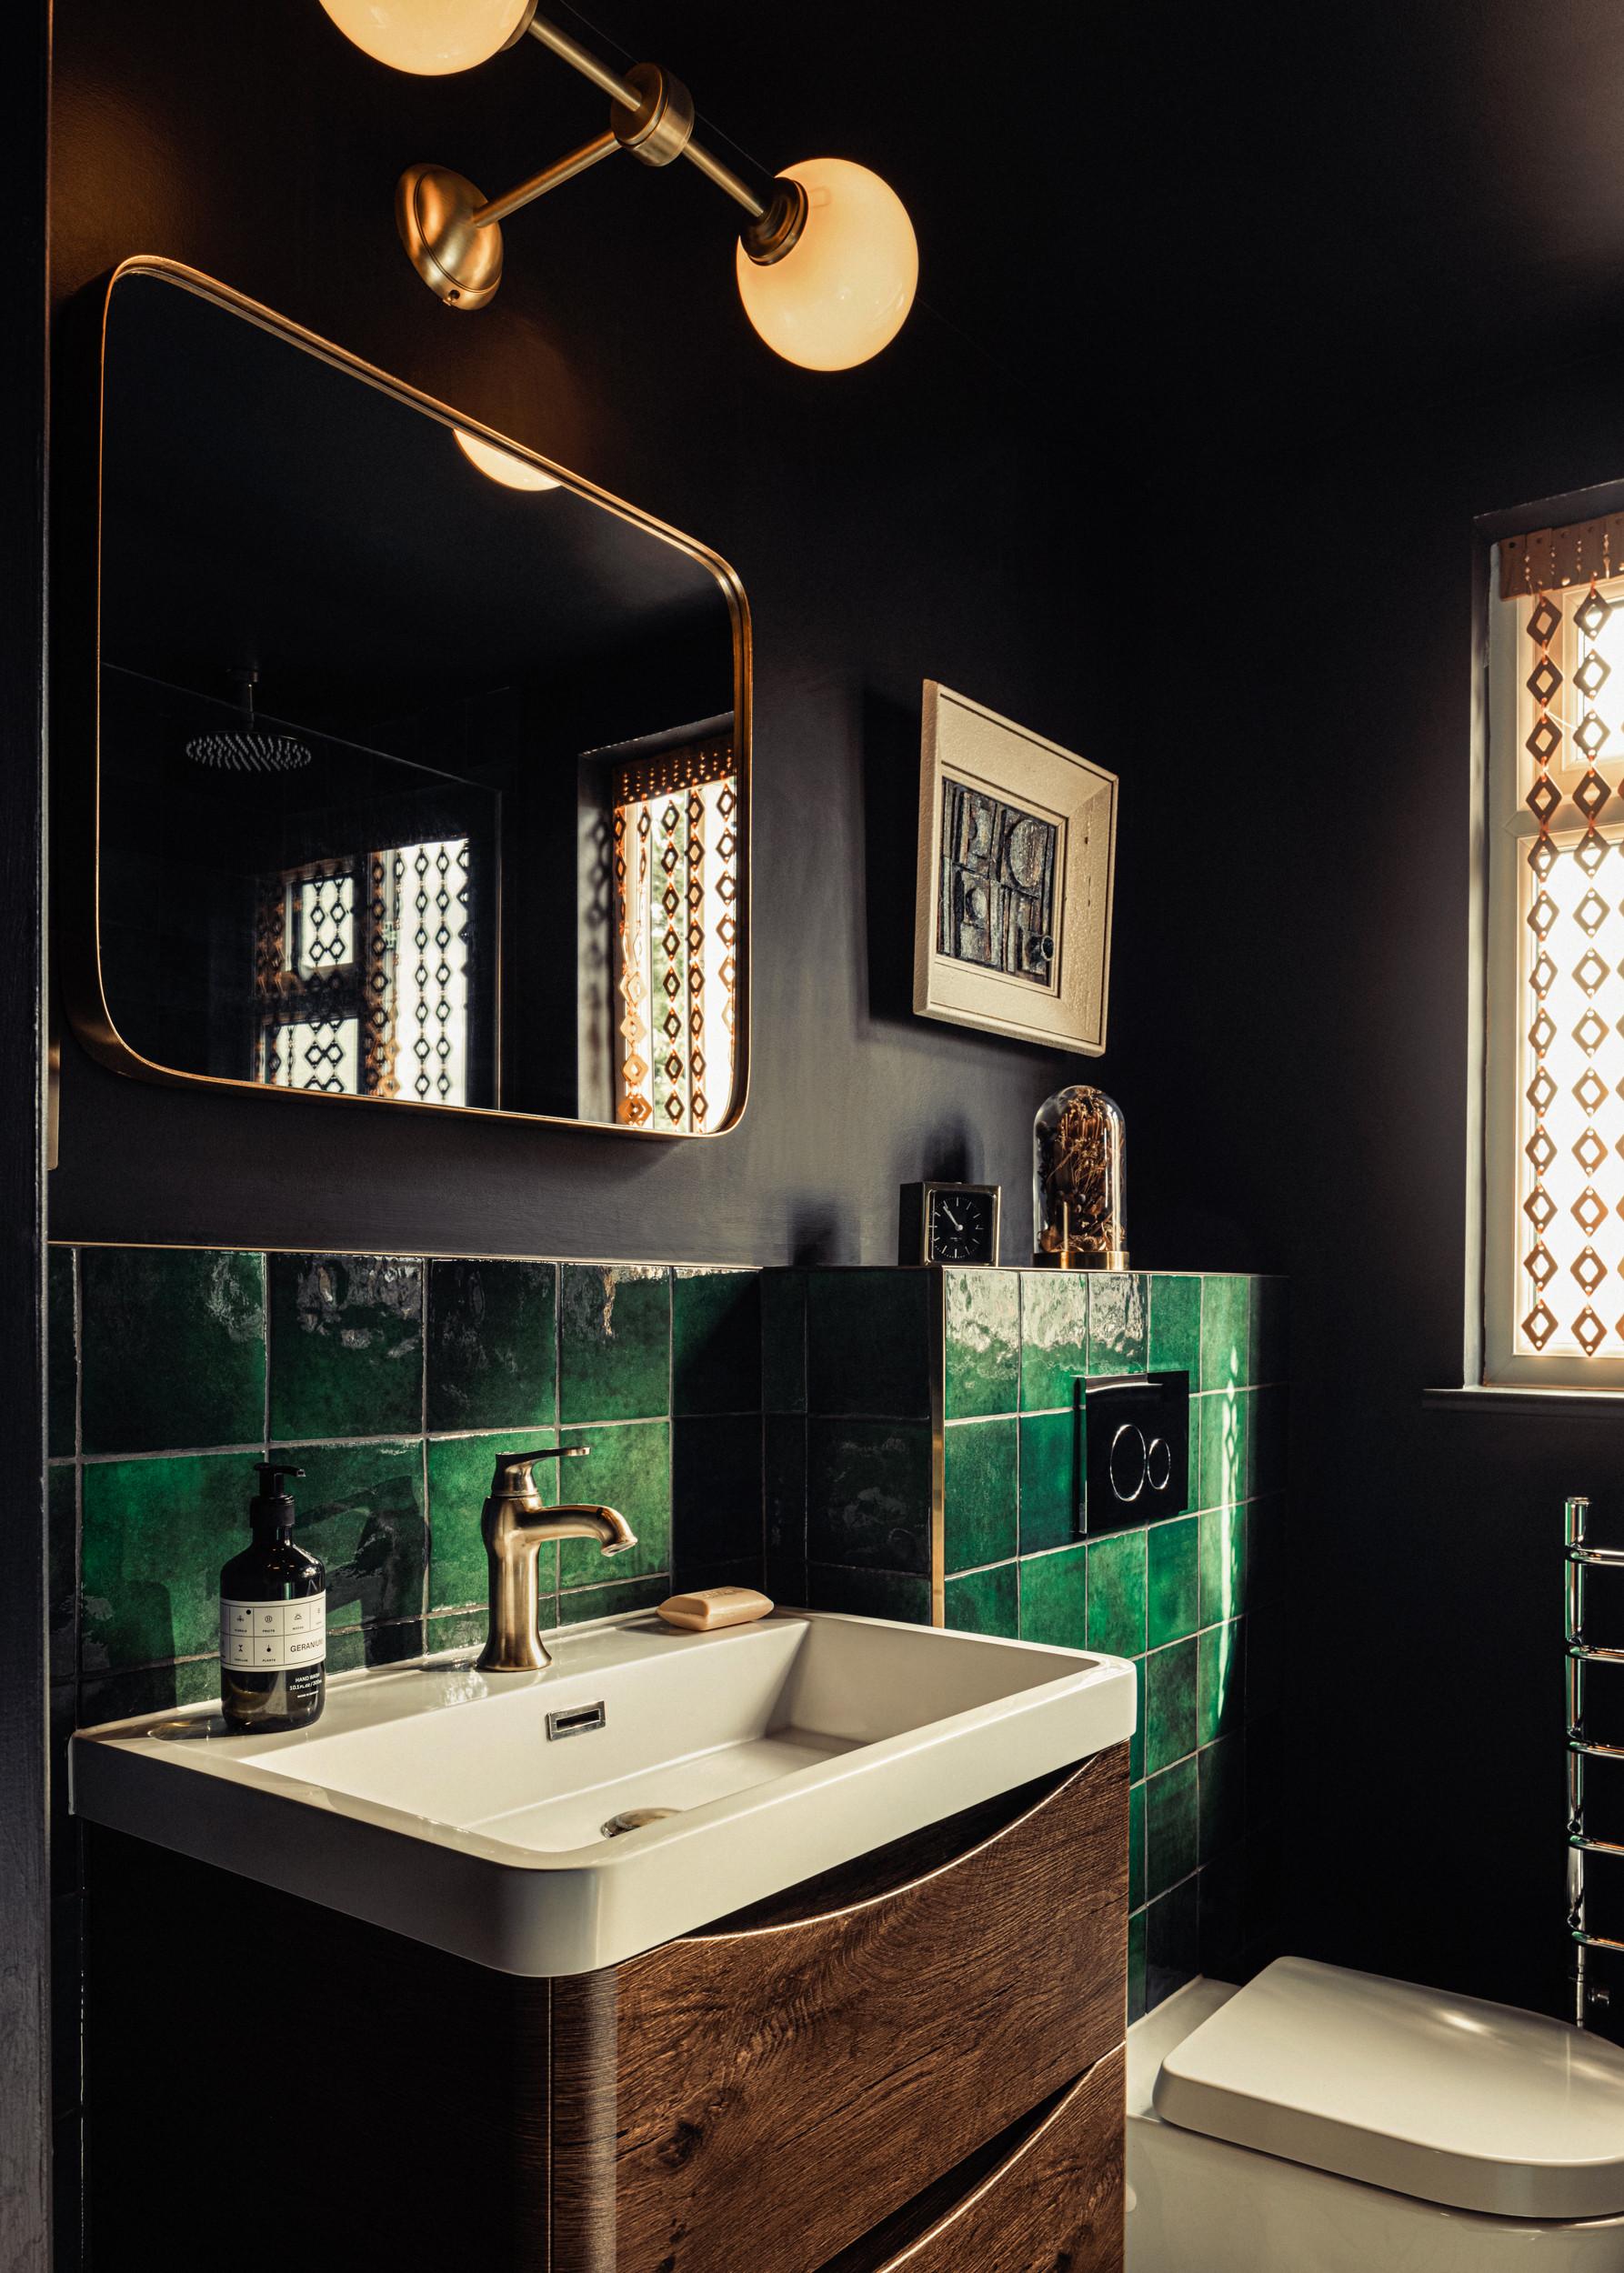 Dark bathroom with green tiles